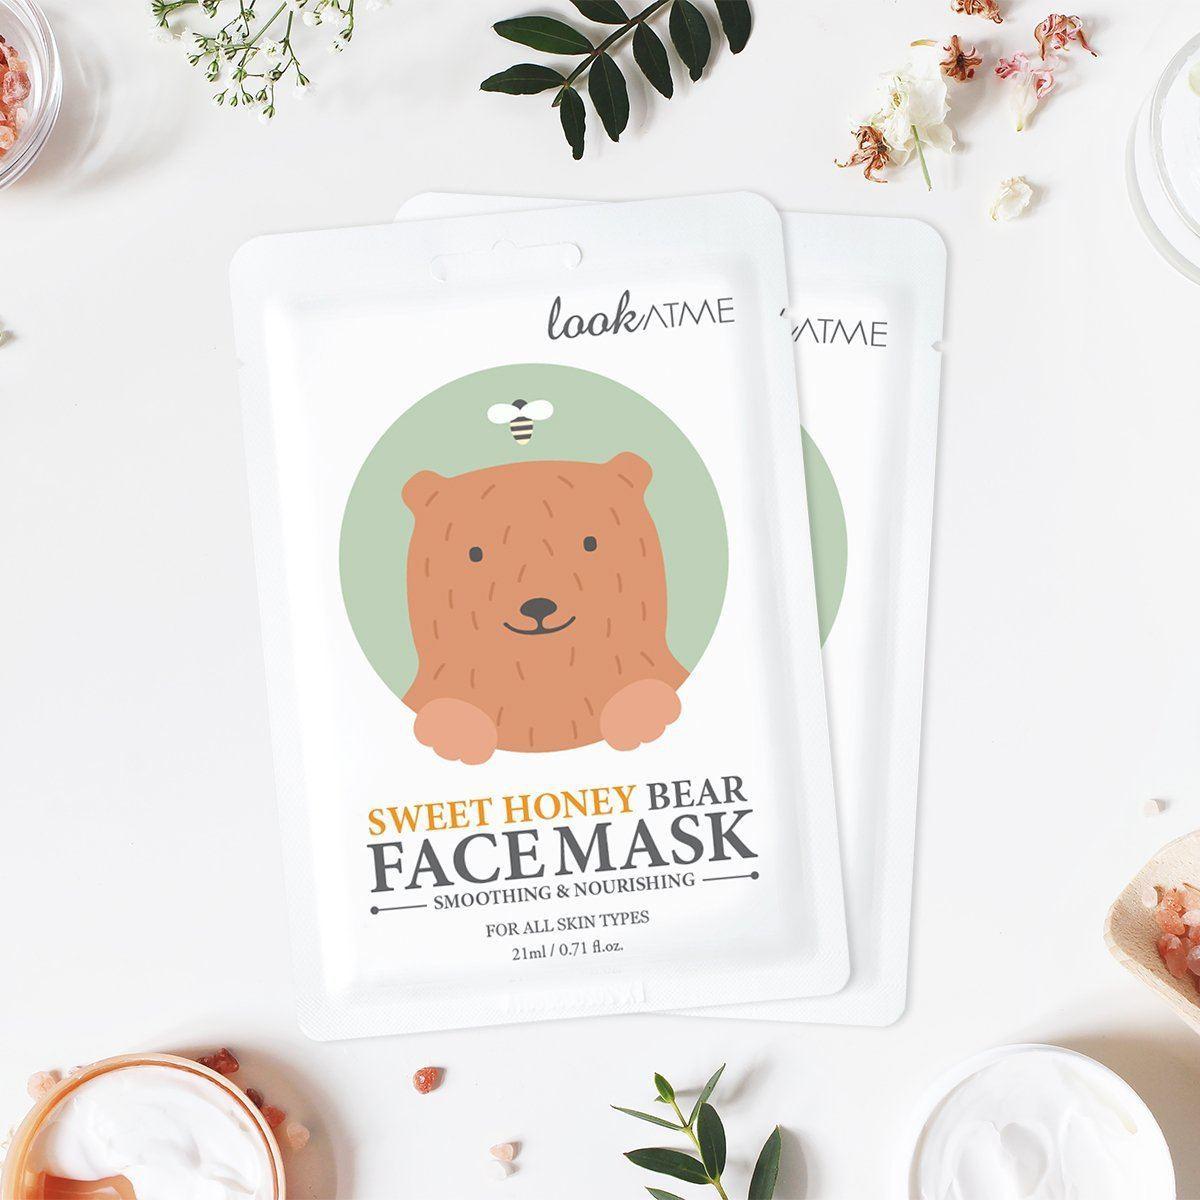 Look at me Sweet Honey Bear Nourishing Mask